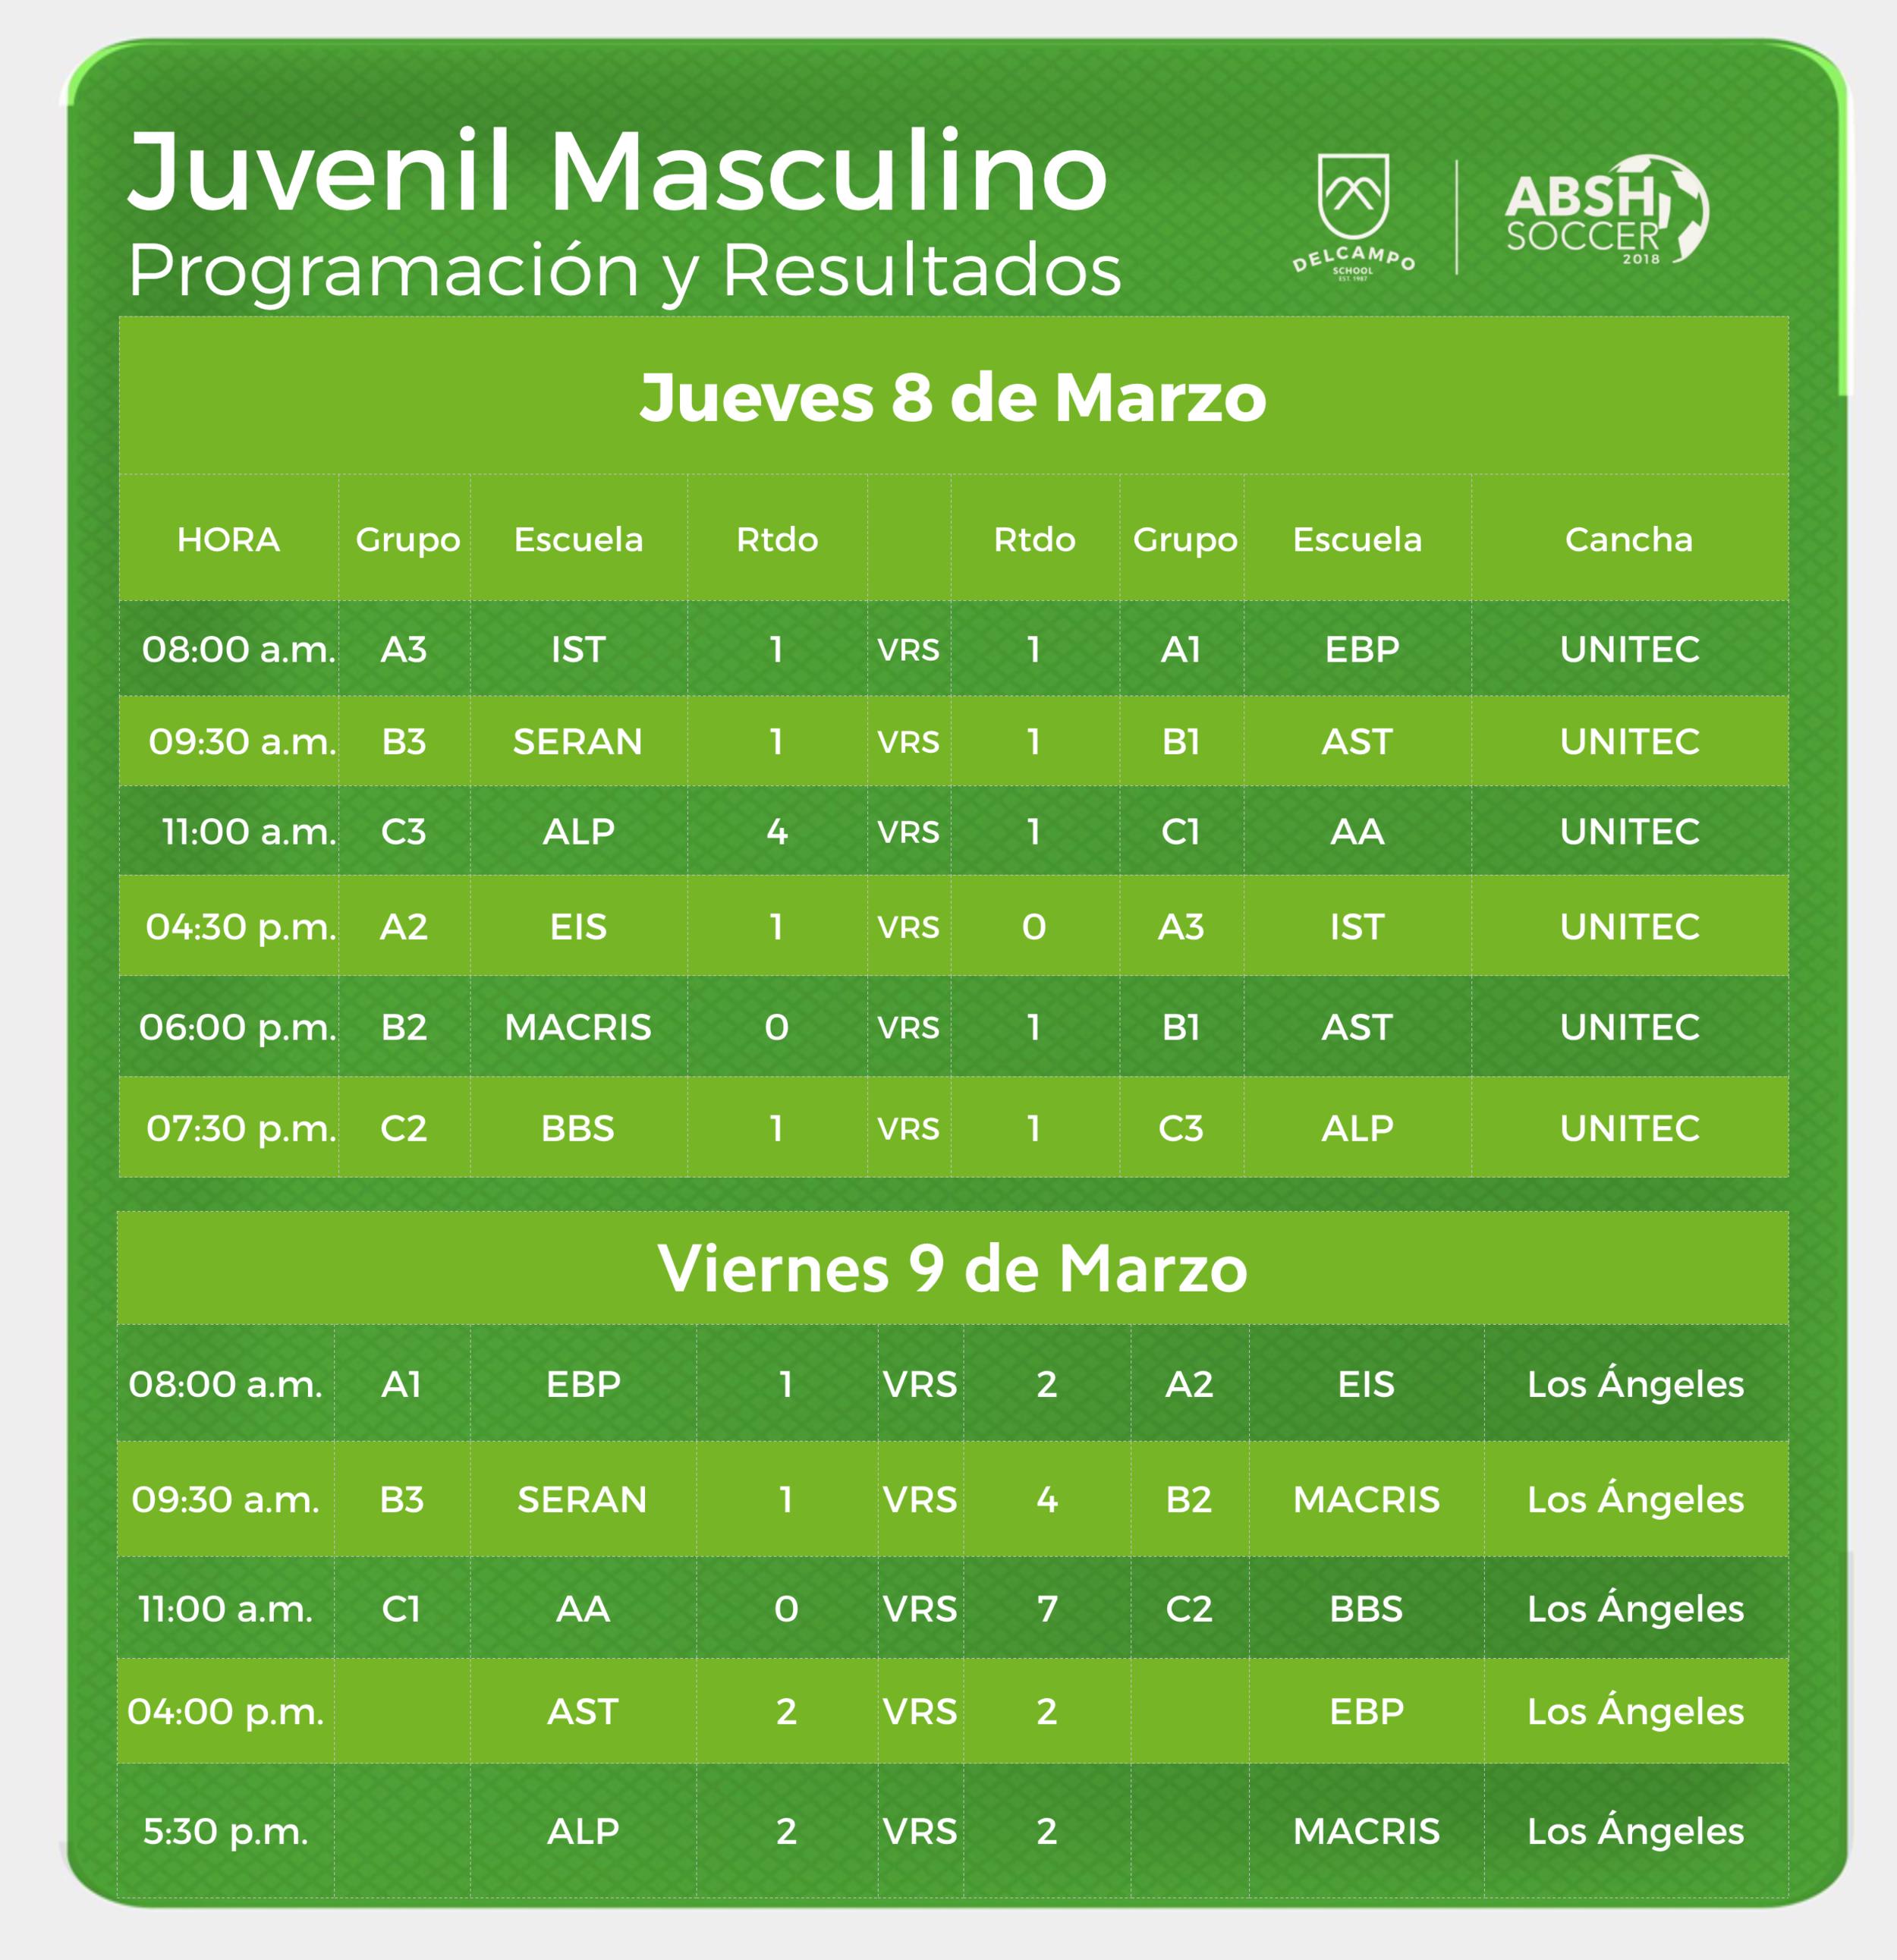 JUVENIL MASCULINO